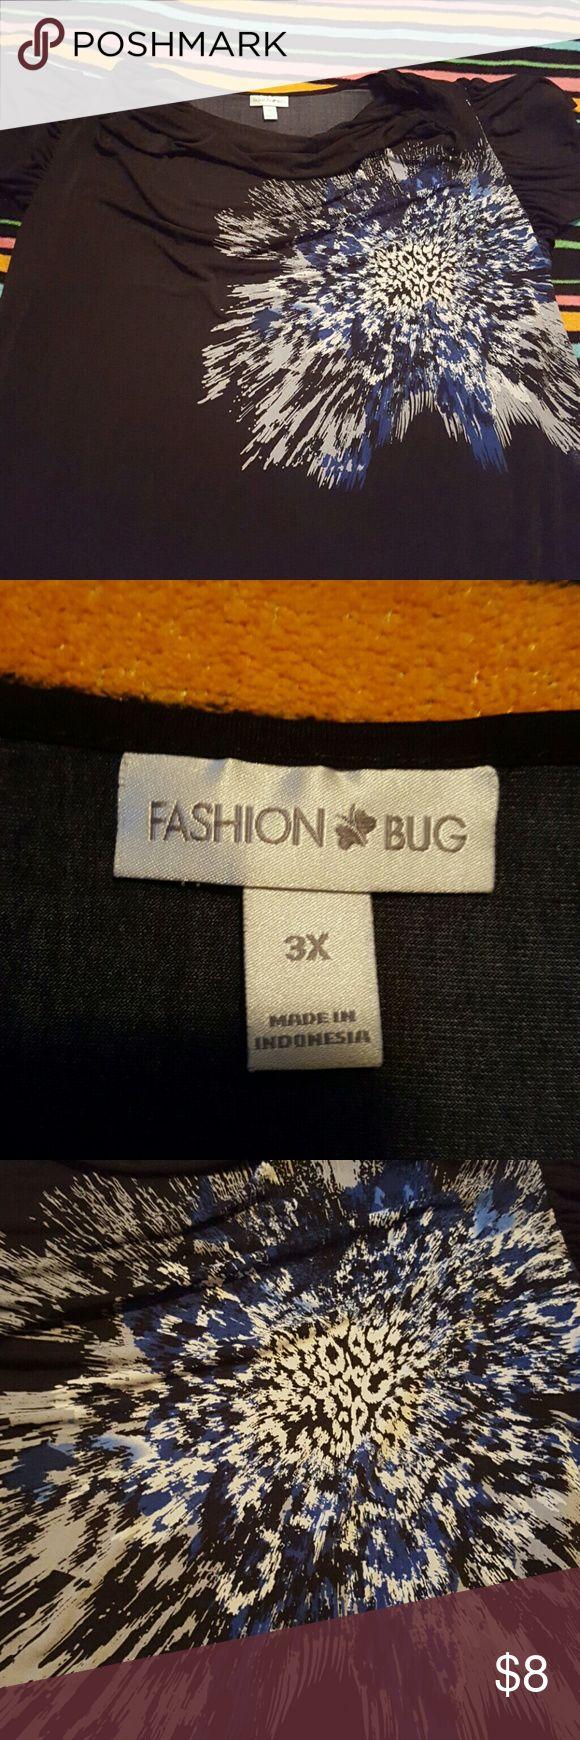 Black blue and white blouse Short sleeve black blue and white blouse Fashion Bug Tops Blouses